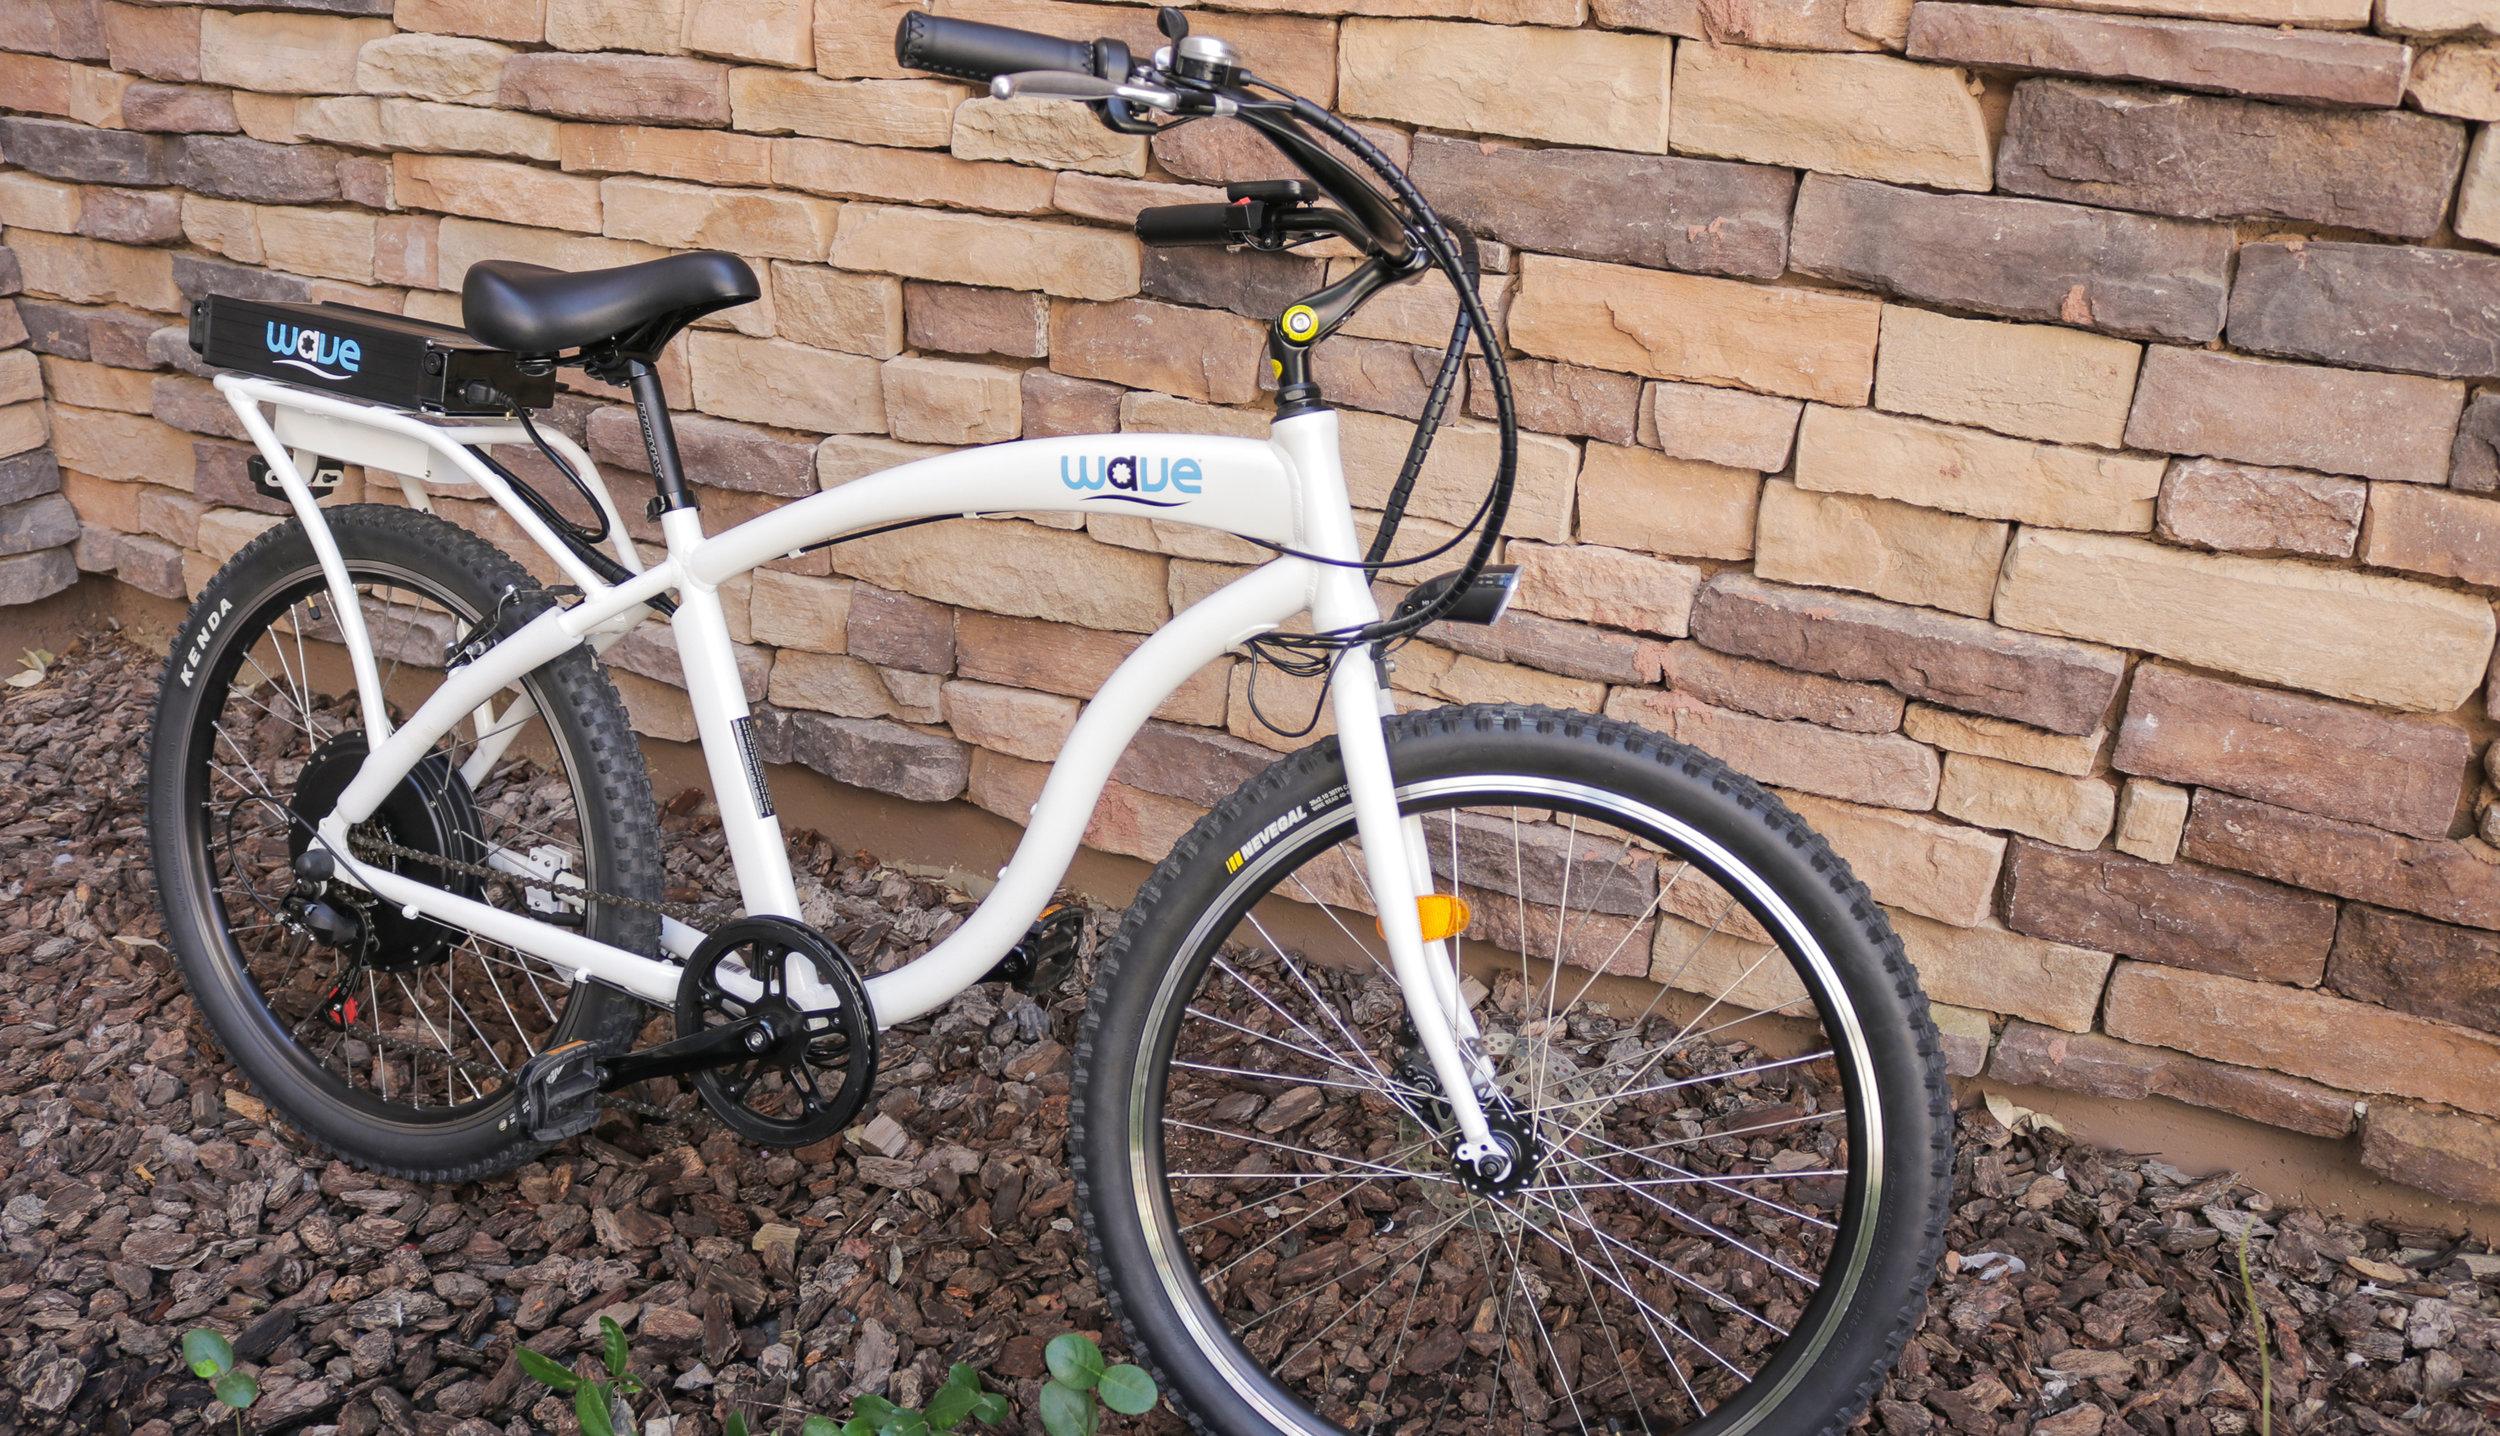 electrified-reviews-wave-electric-bike-review-profile-2.jpg